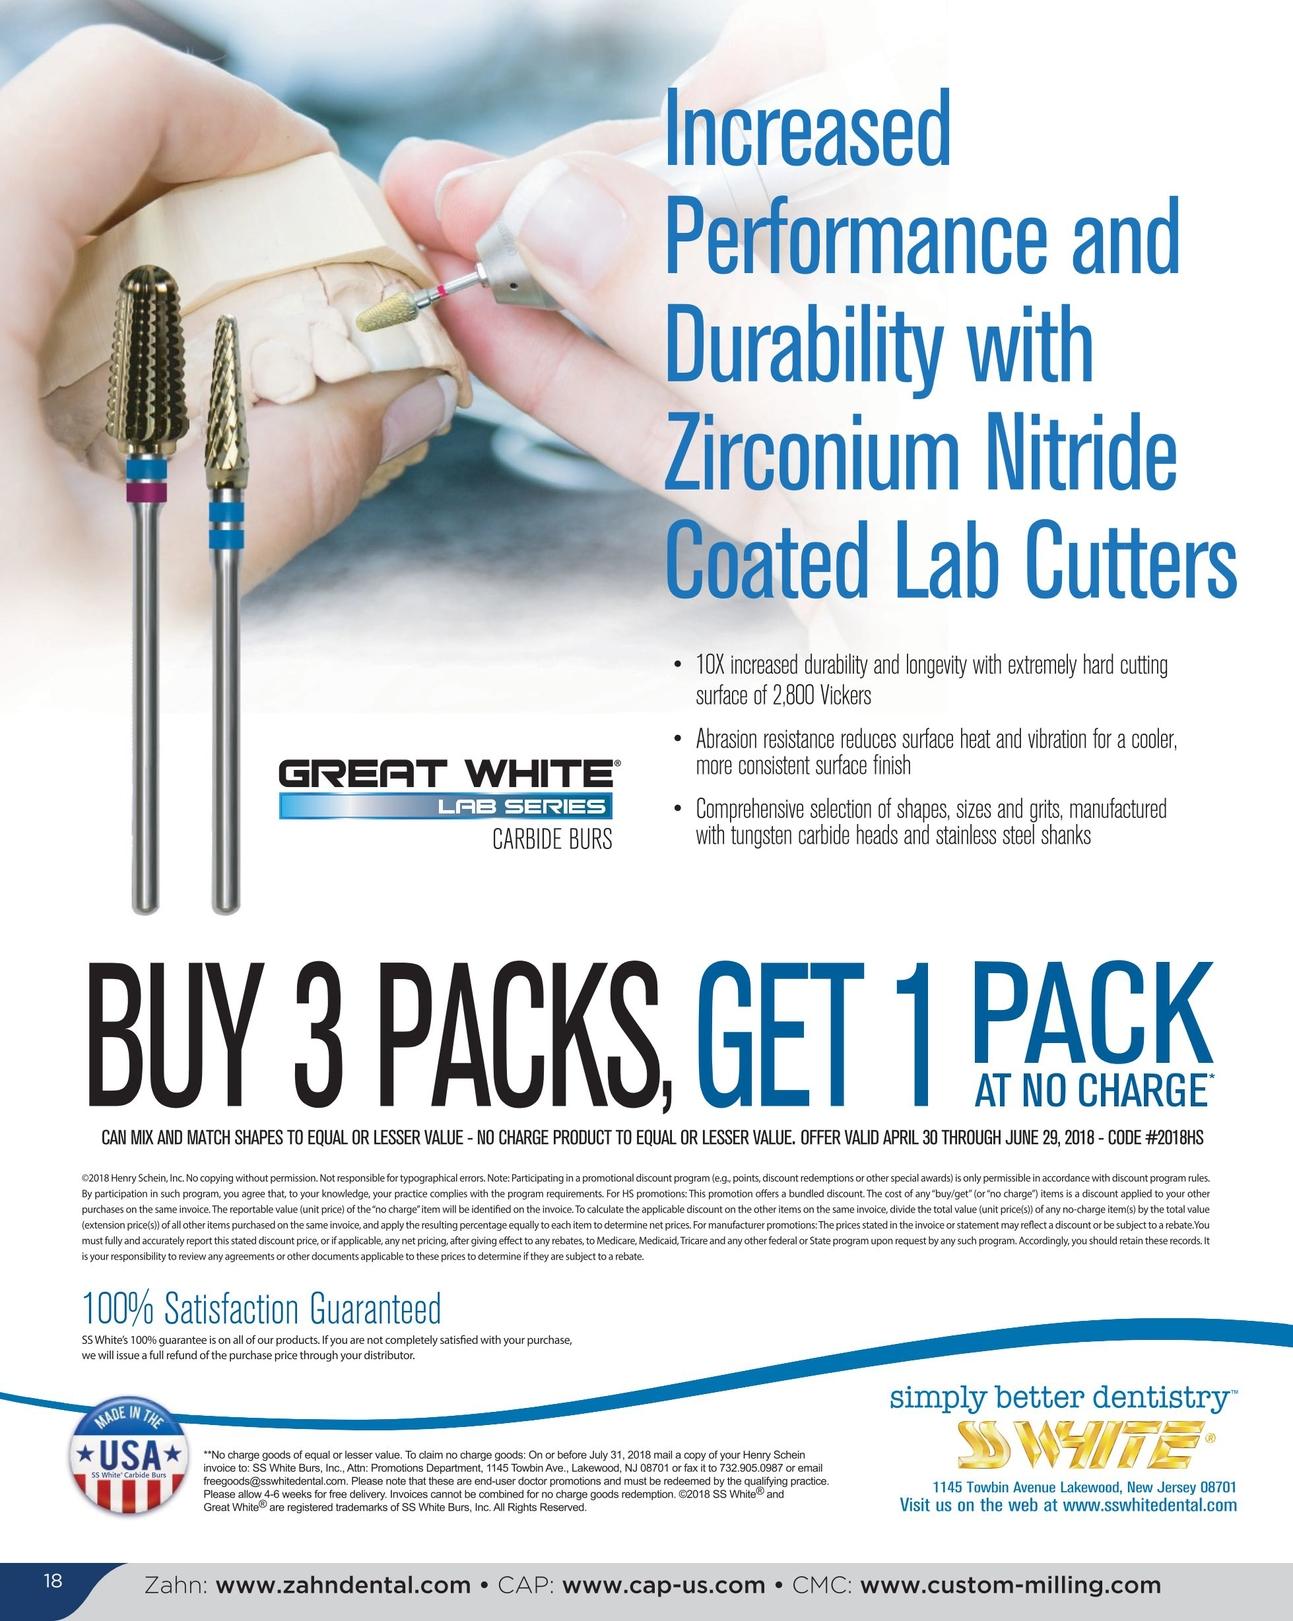 Zahn Dental Sales - May/June 2018